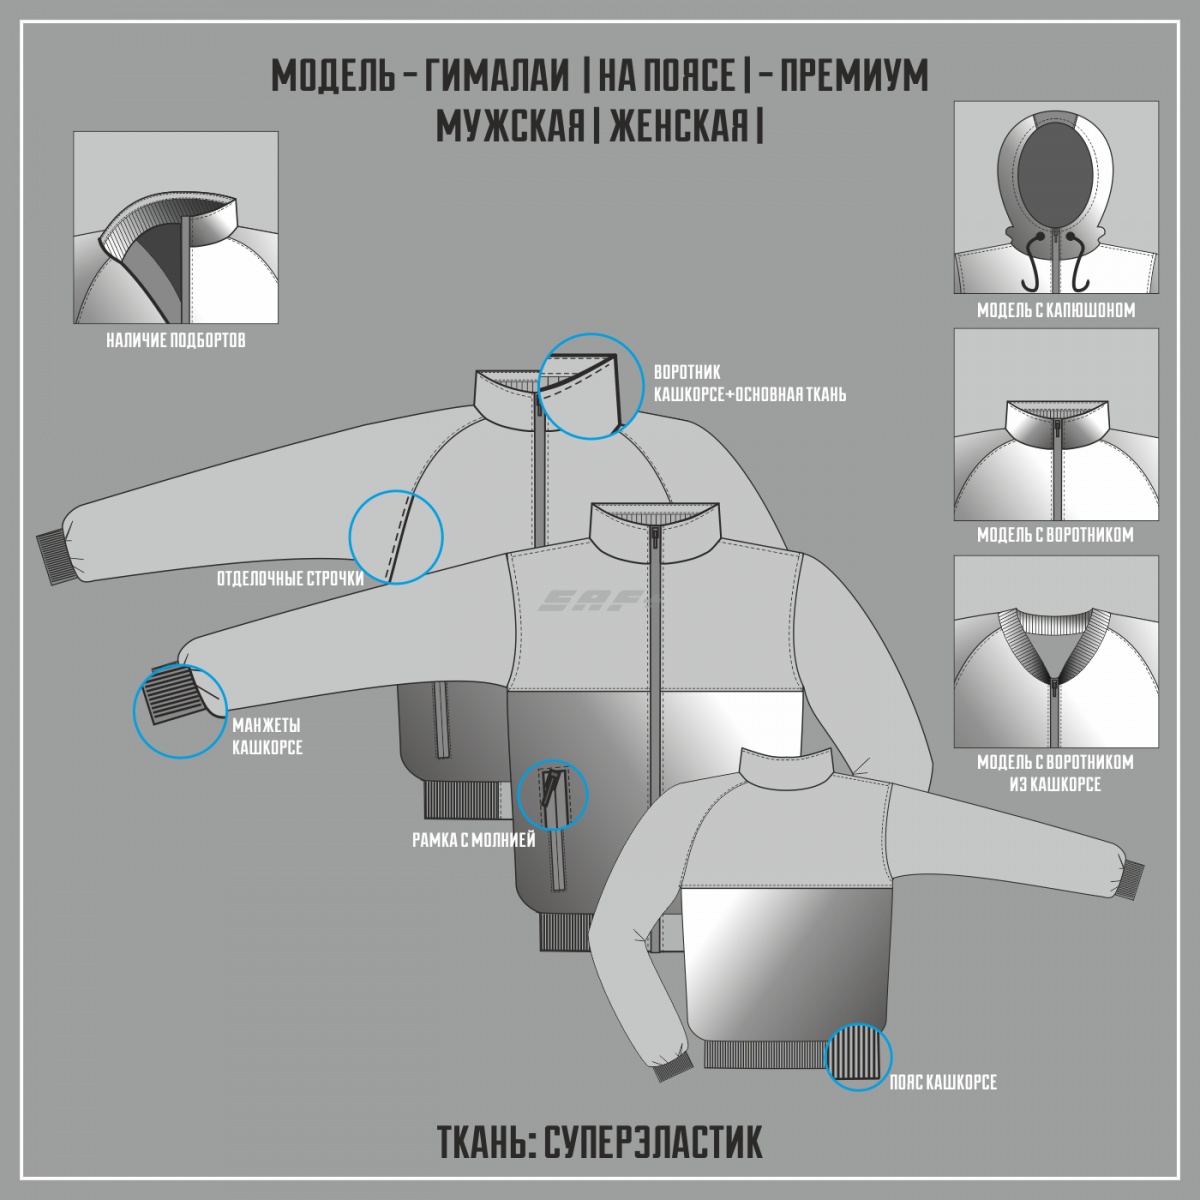 ГИМАЛАИ-СУПЕРЭЛАСТИК ПРЕМИУМ куртка на поясе (Частичная сублимация)